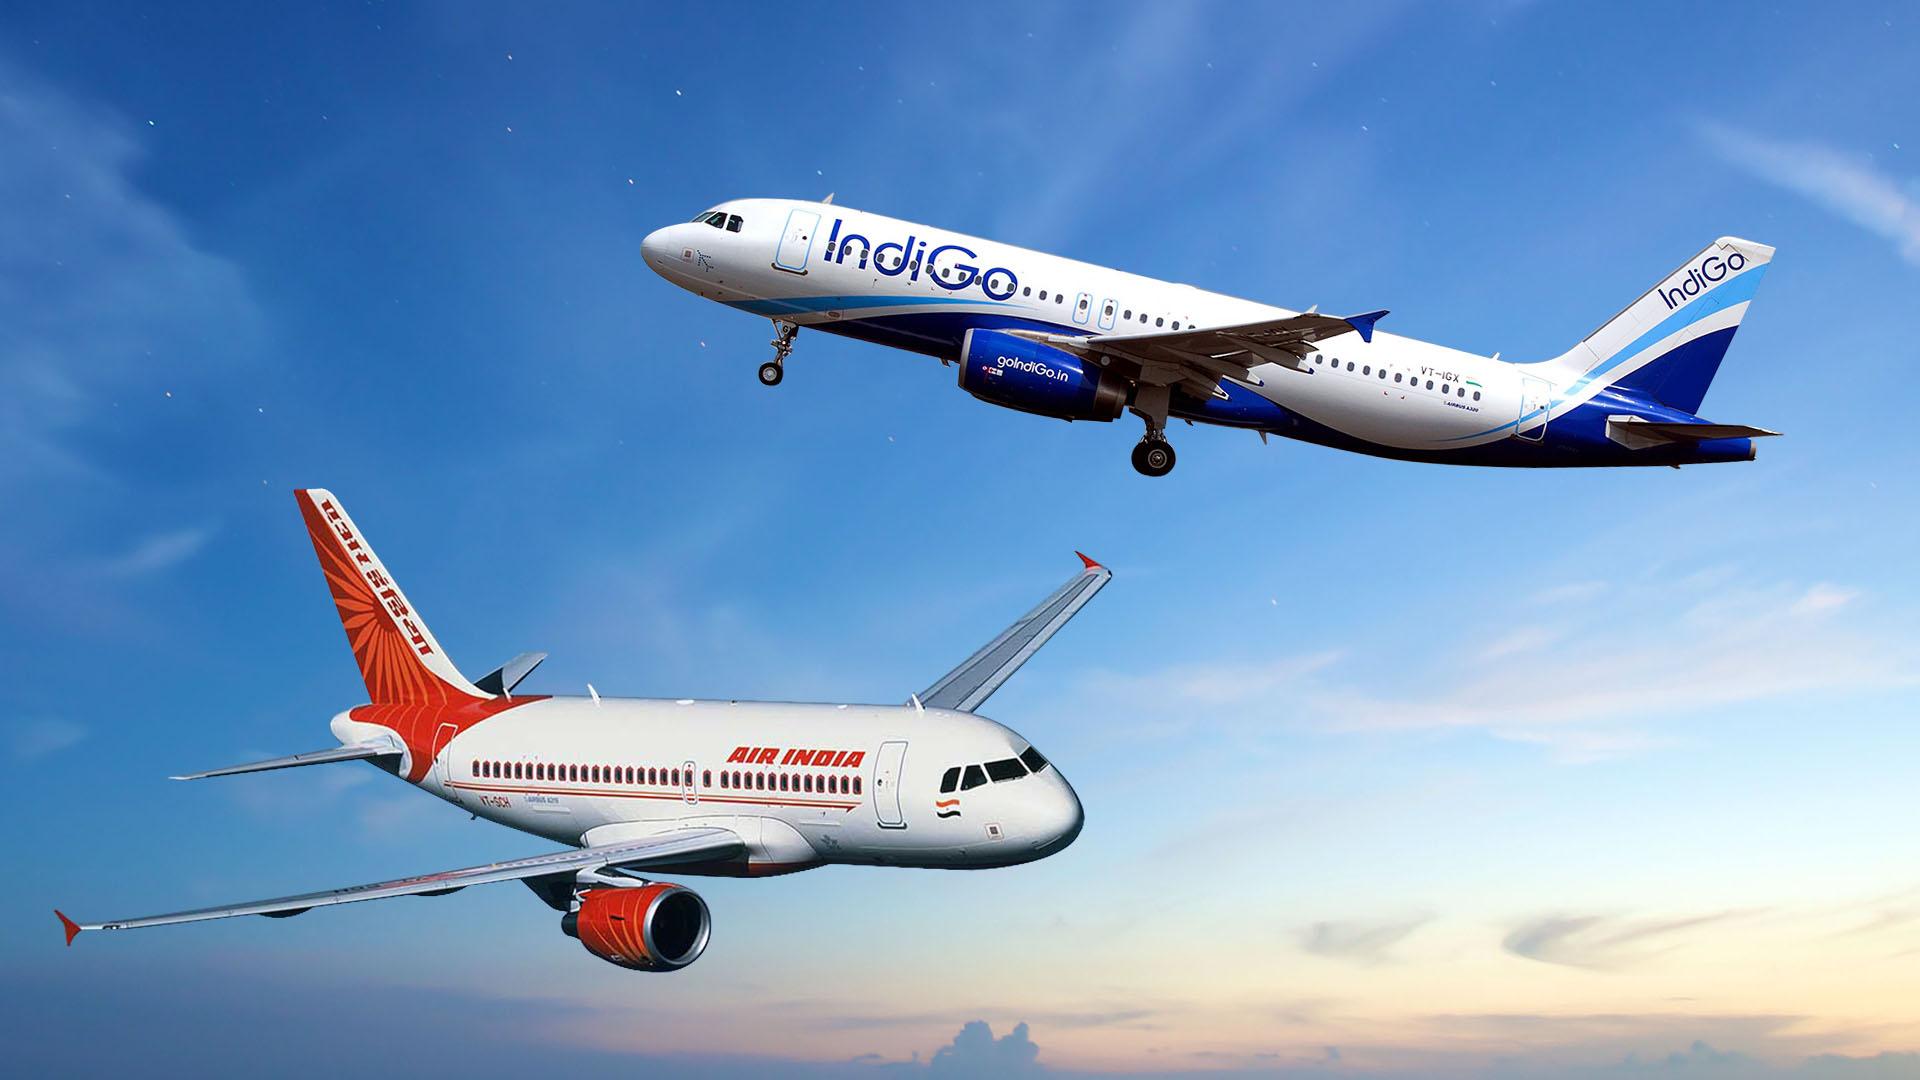 Air-india-and-Indigo